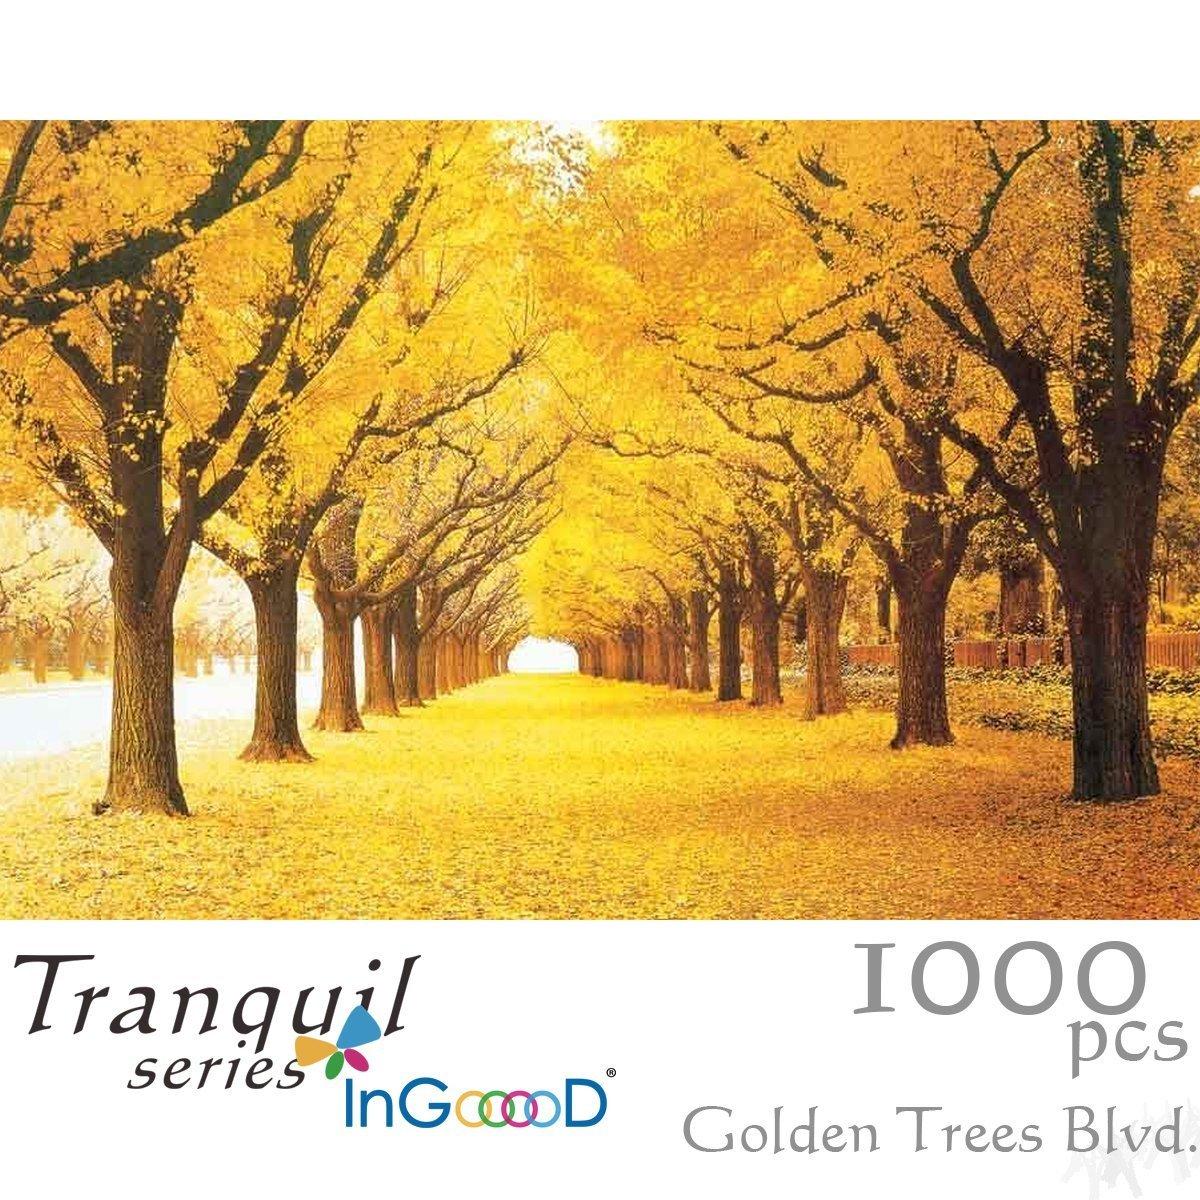 【開店記念セール!】 Ingooood Pieces Tranquil Blvd- Series- Golden Trees Series- Blvd- Jigsaw Puzzles 1000 Pieces for Adult B07FD3Z2Q9, 島根県出雲地方の酒蔵 竹下本店:b134d411 --- 4x4.lt